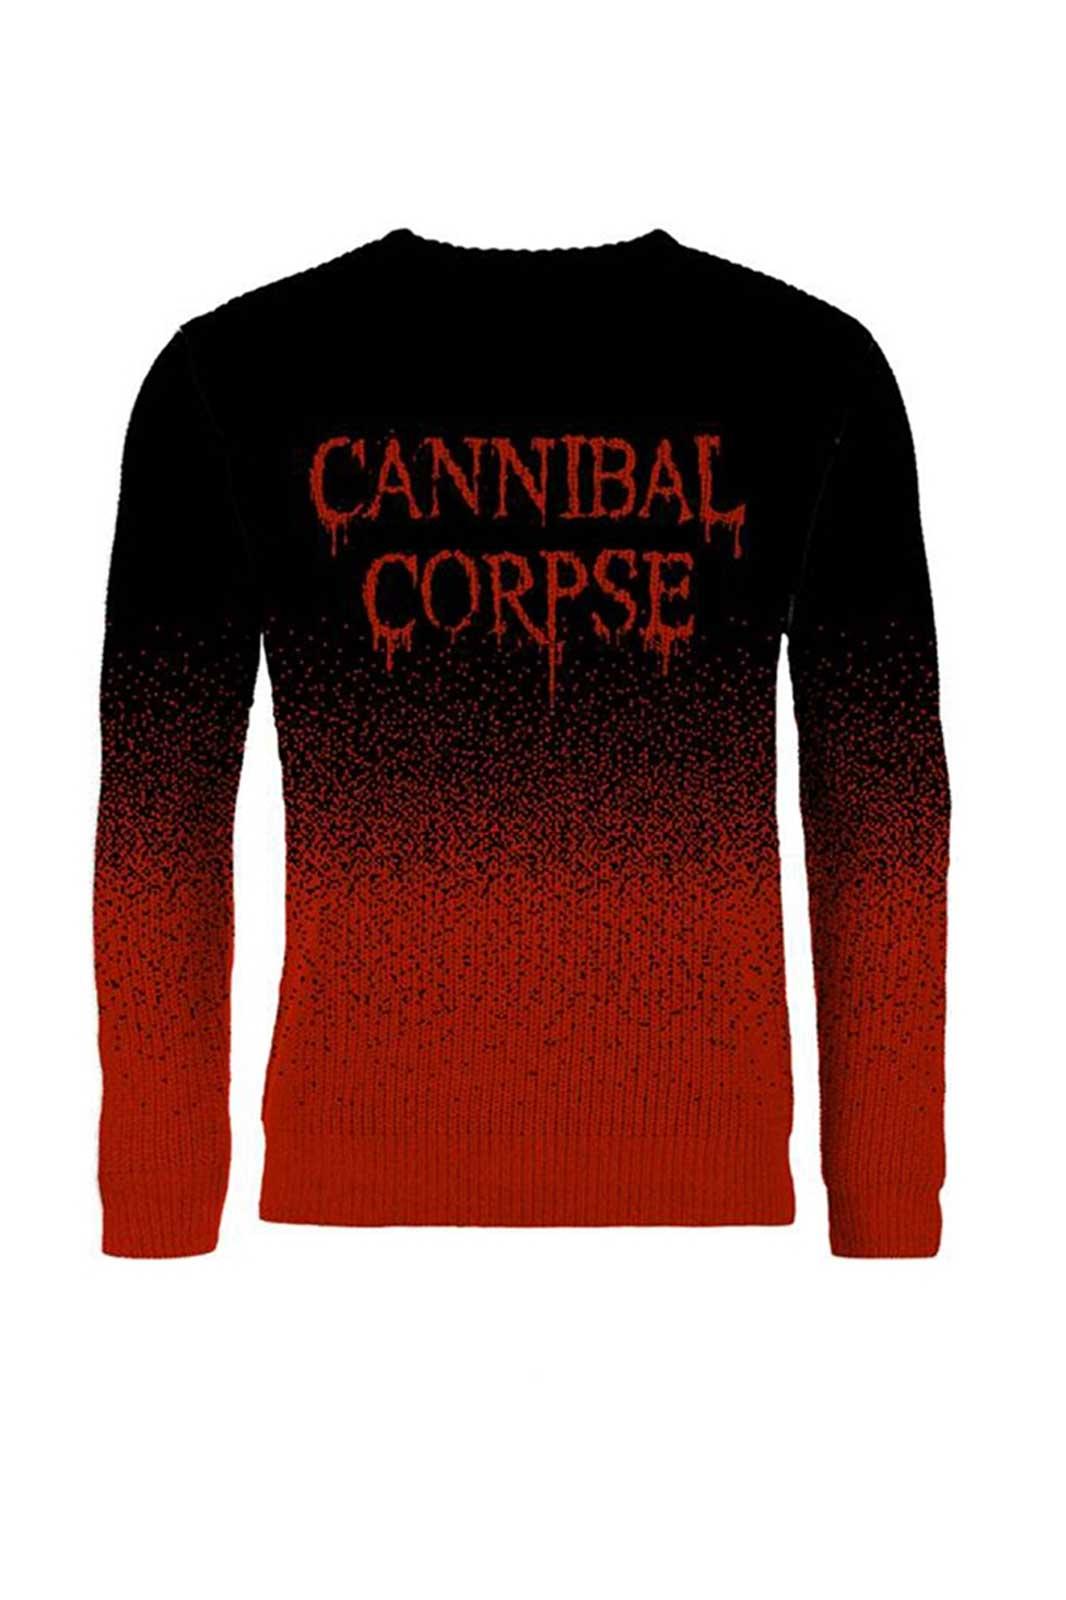 Christmas Sweater Cannibal Corpse